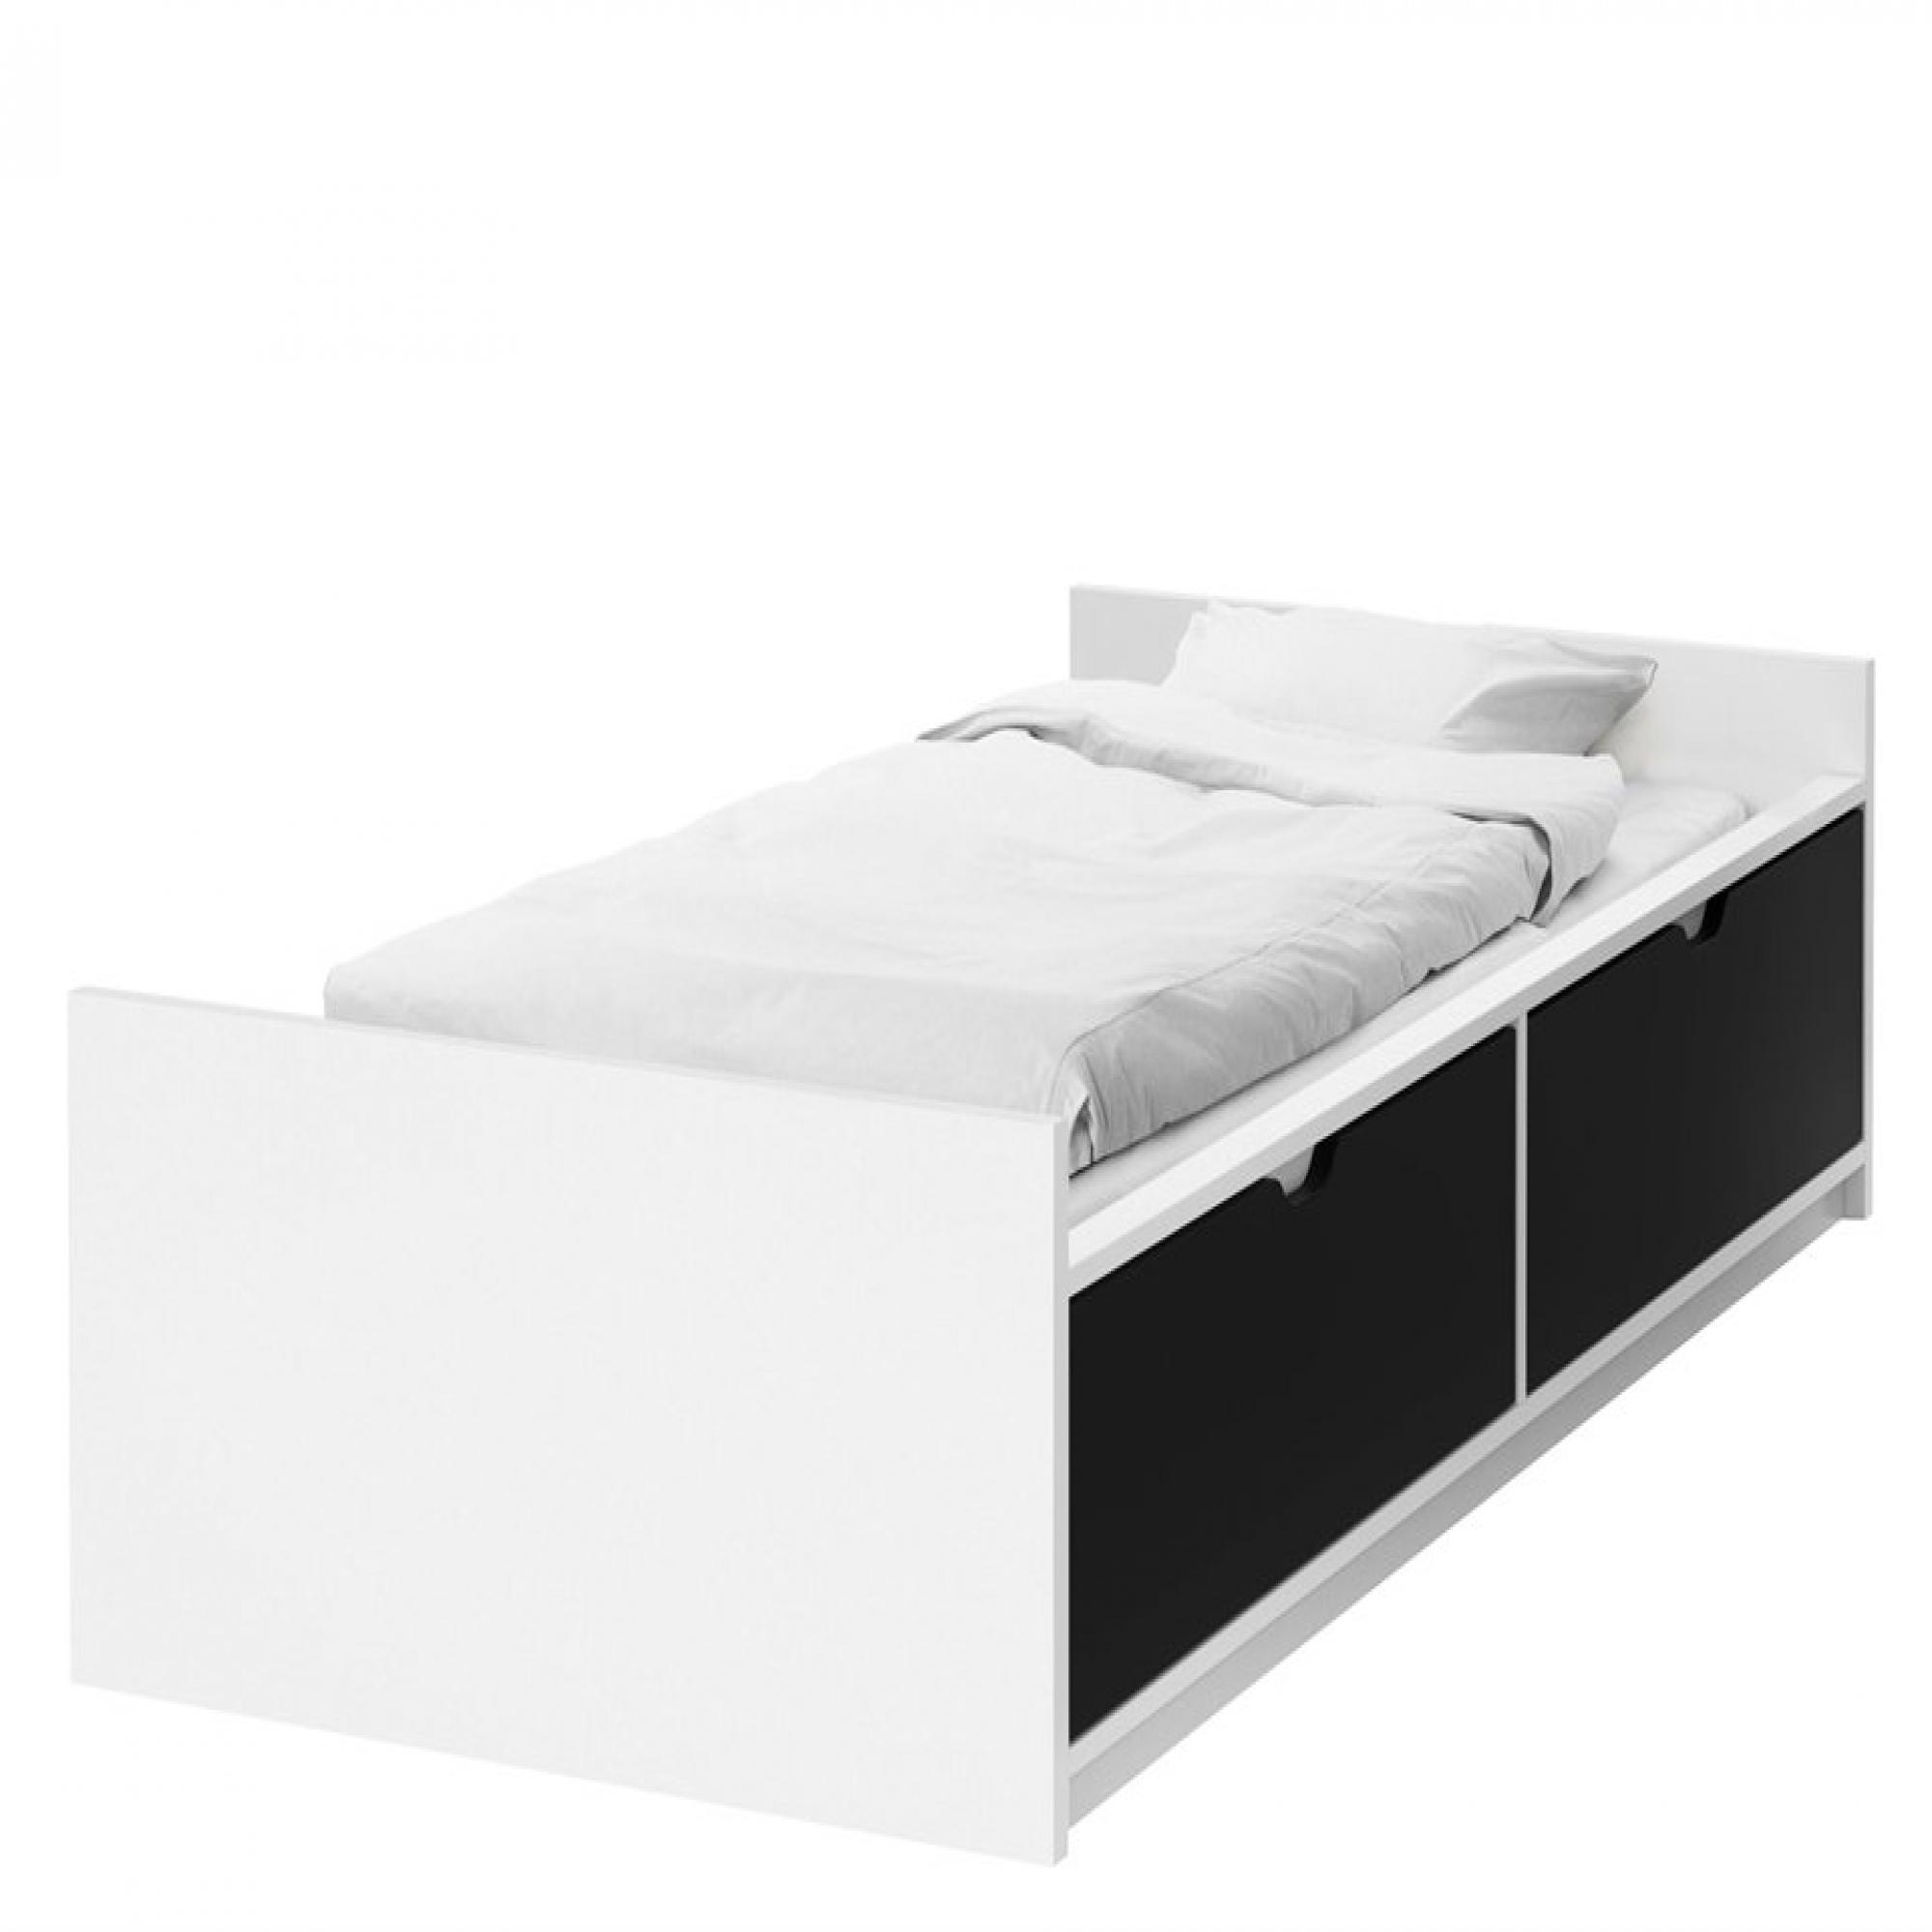 Flaxa estructura cama 90 con almacenaje inferior somier - Camas con almacenaje ikea ...